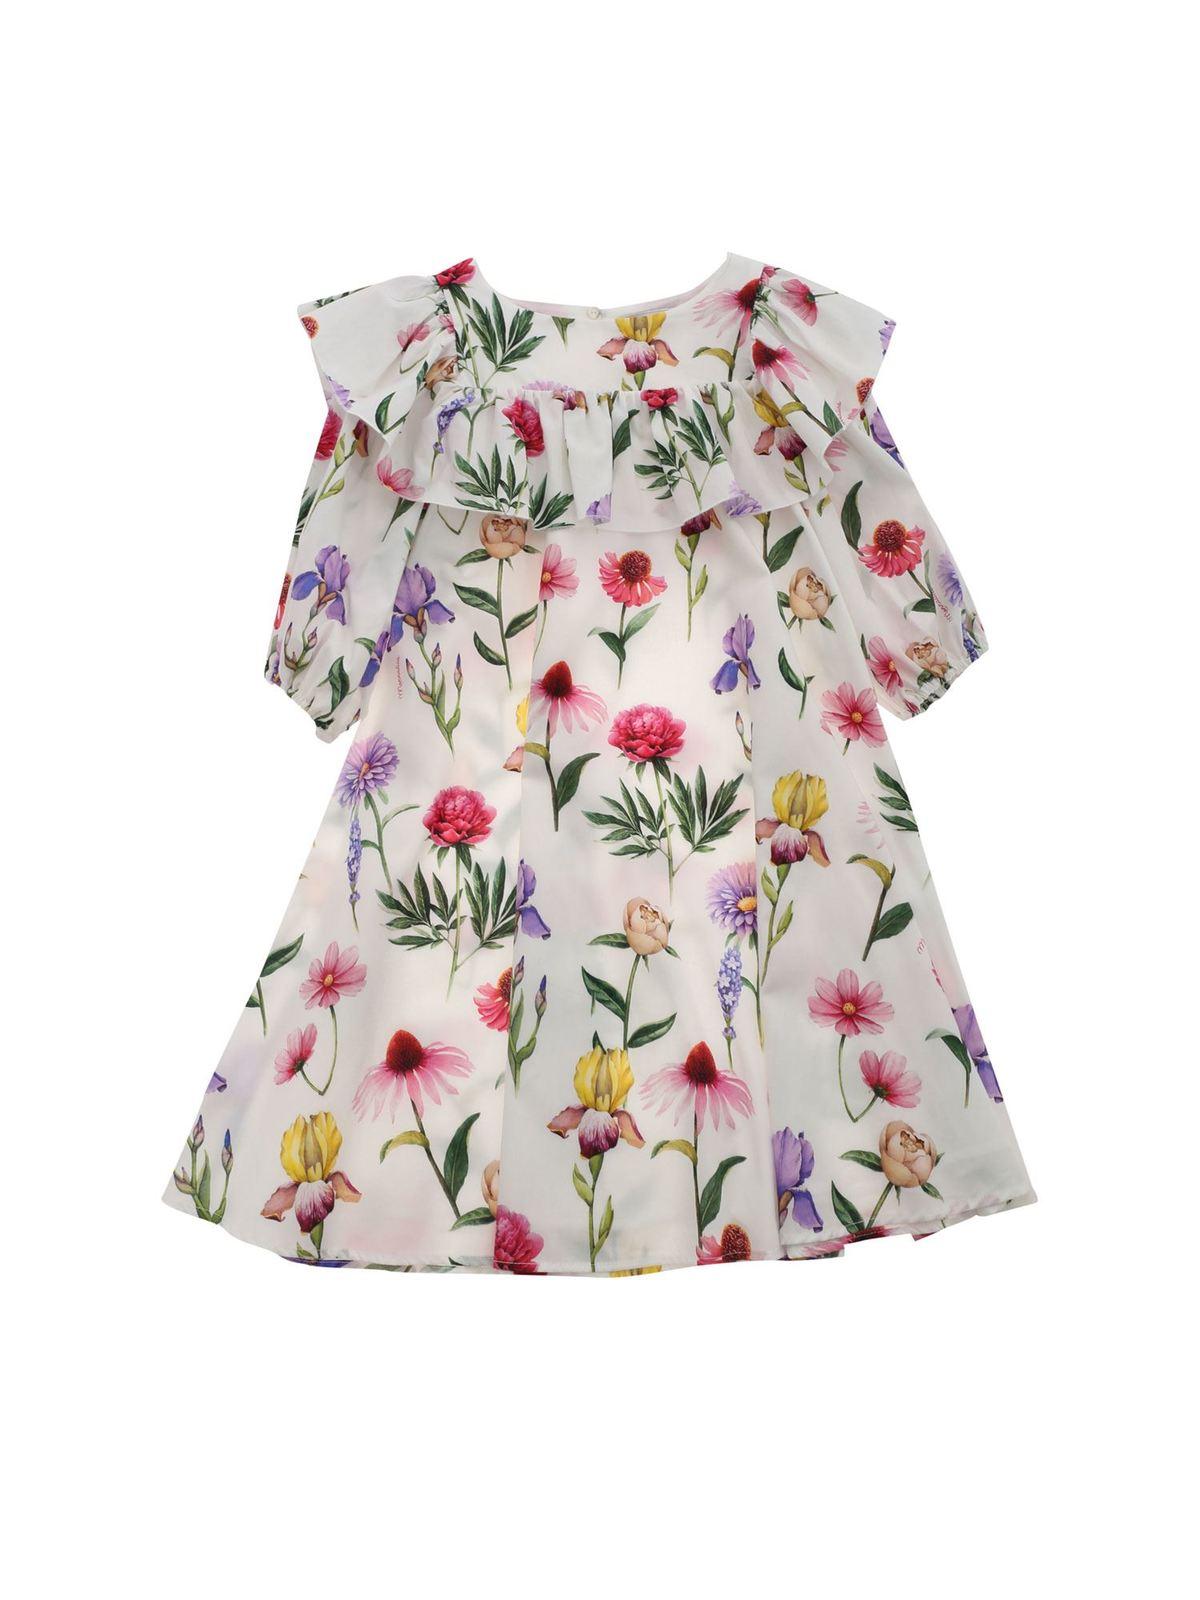 Monnalisa MAXI FLOWER PRINT DRESS IN WHITE